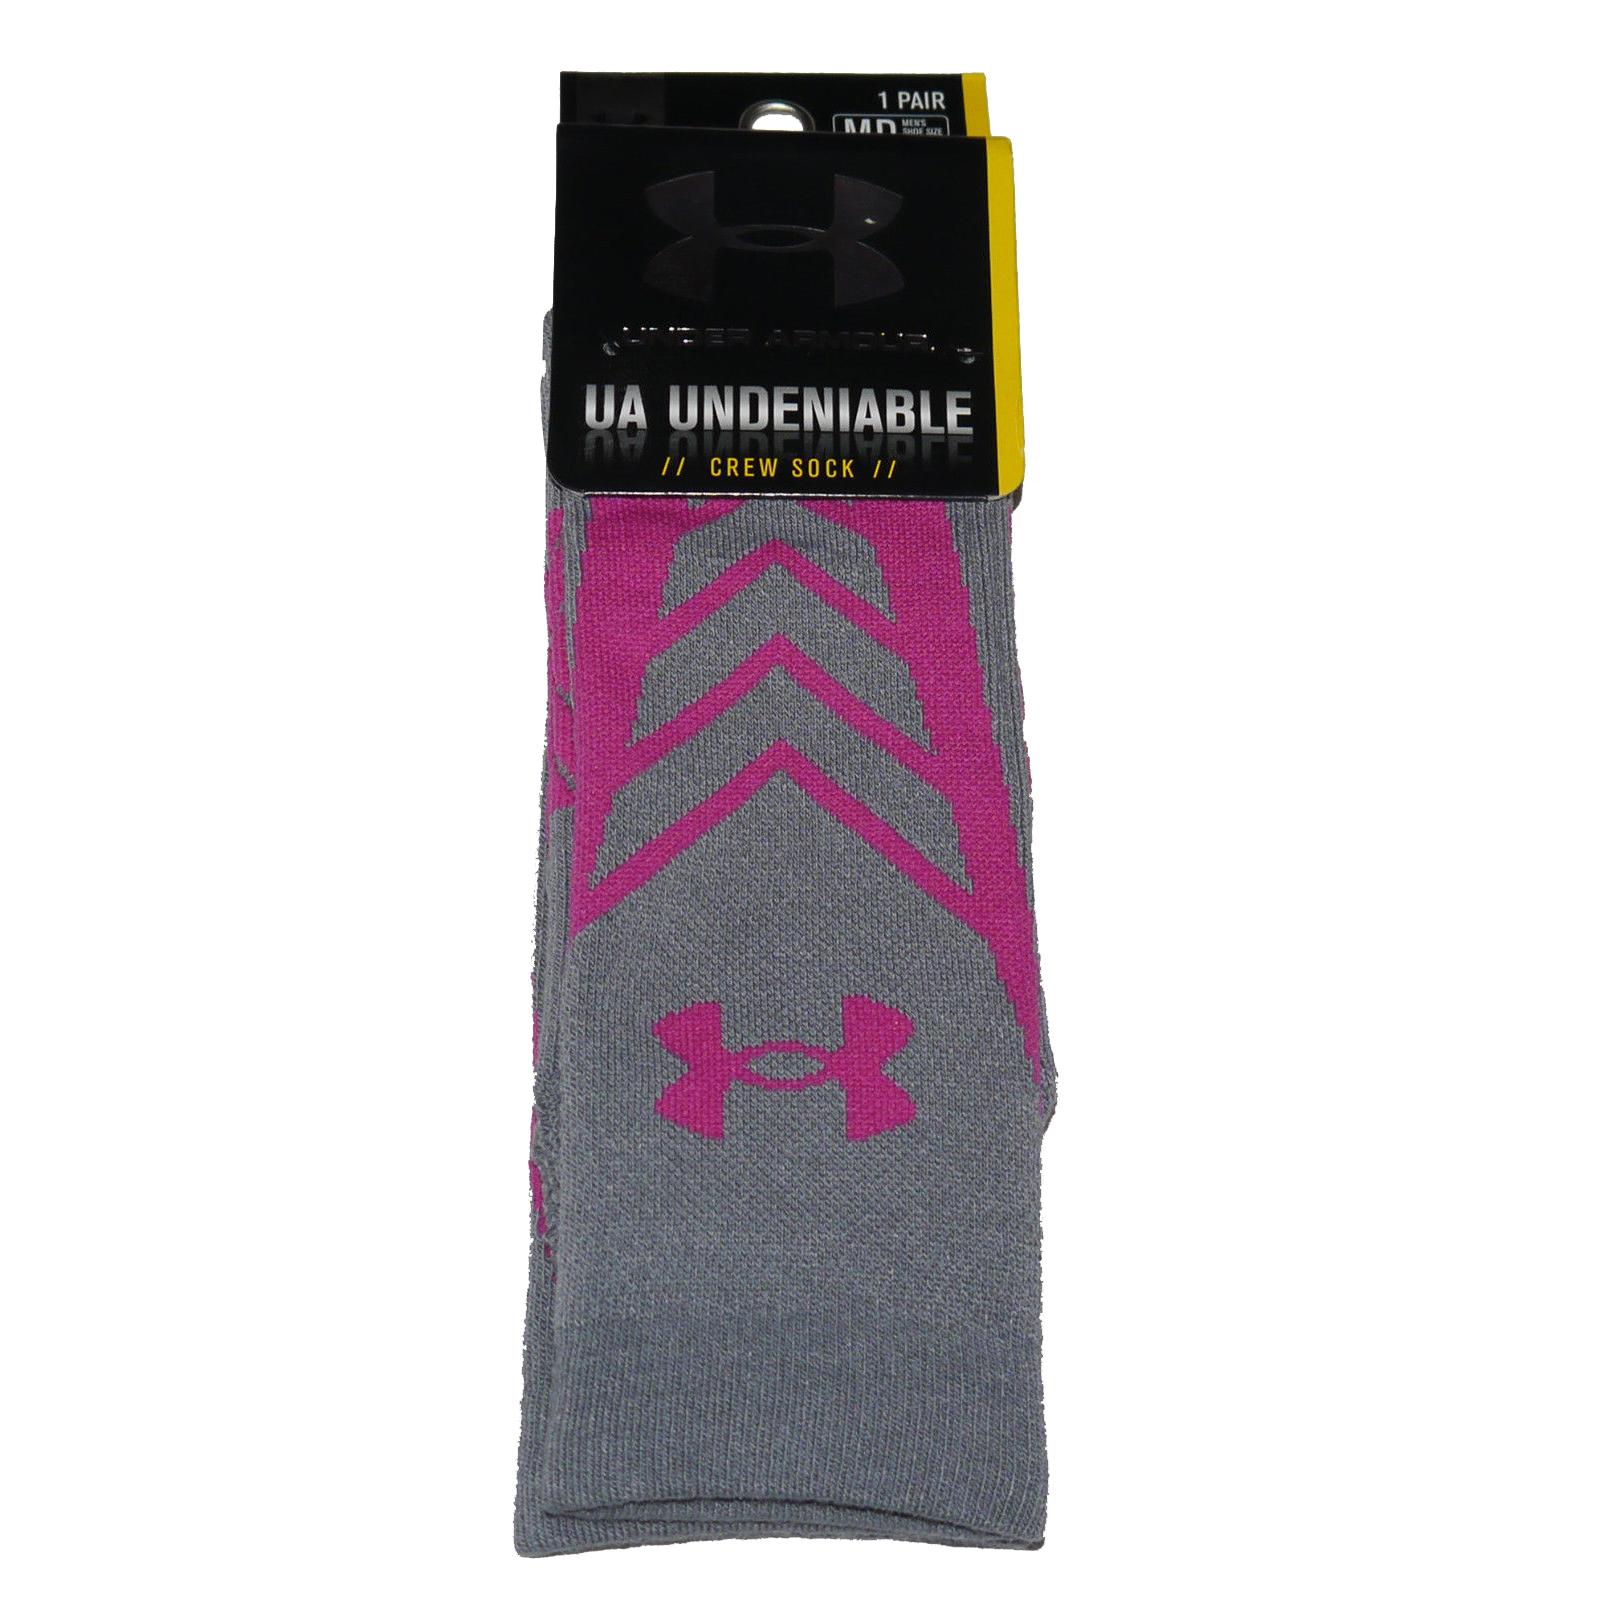 1 Pair Under Armour UA UNDENIABLE Men's Crew Socks  -Stealth Gray & Tropic Pink (Medium) 13060